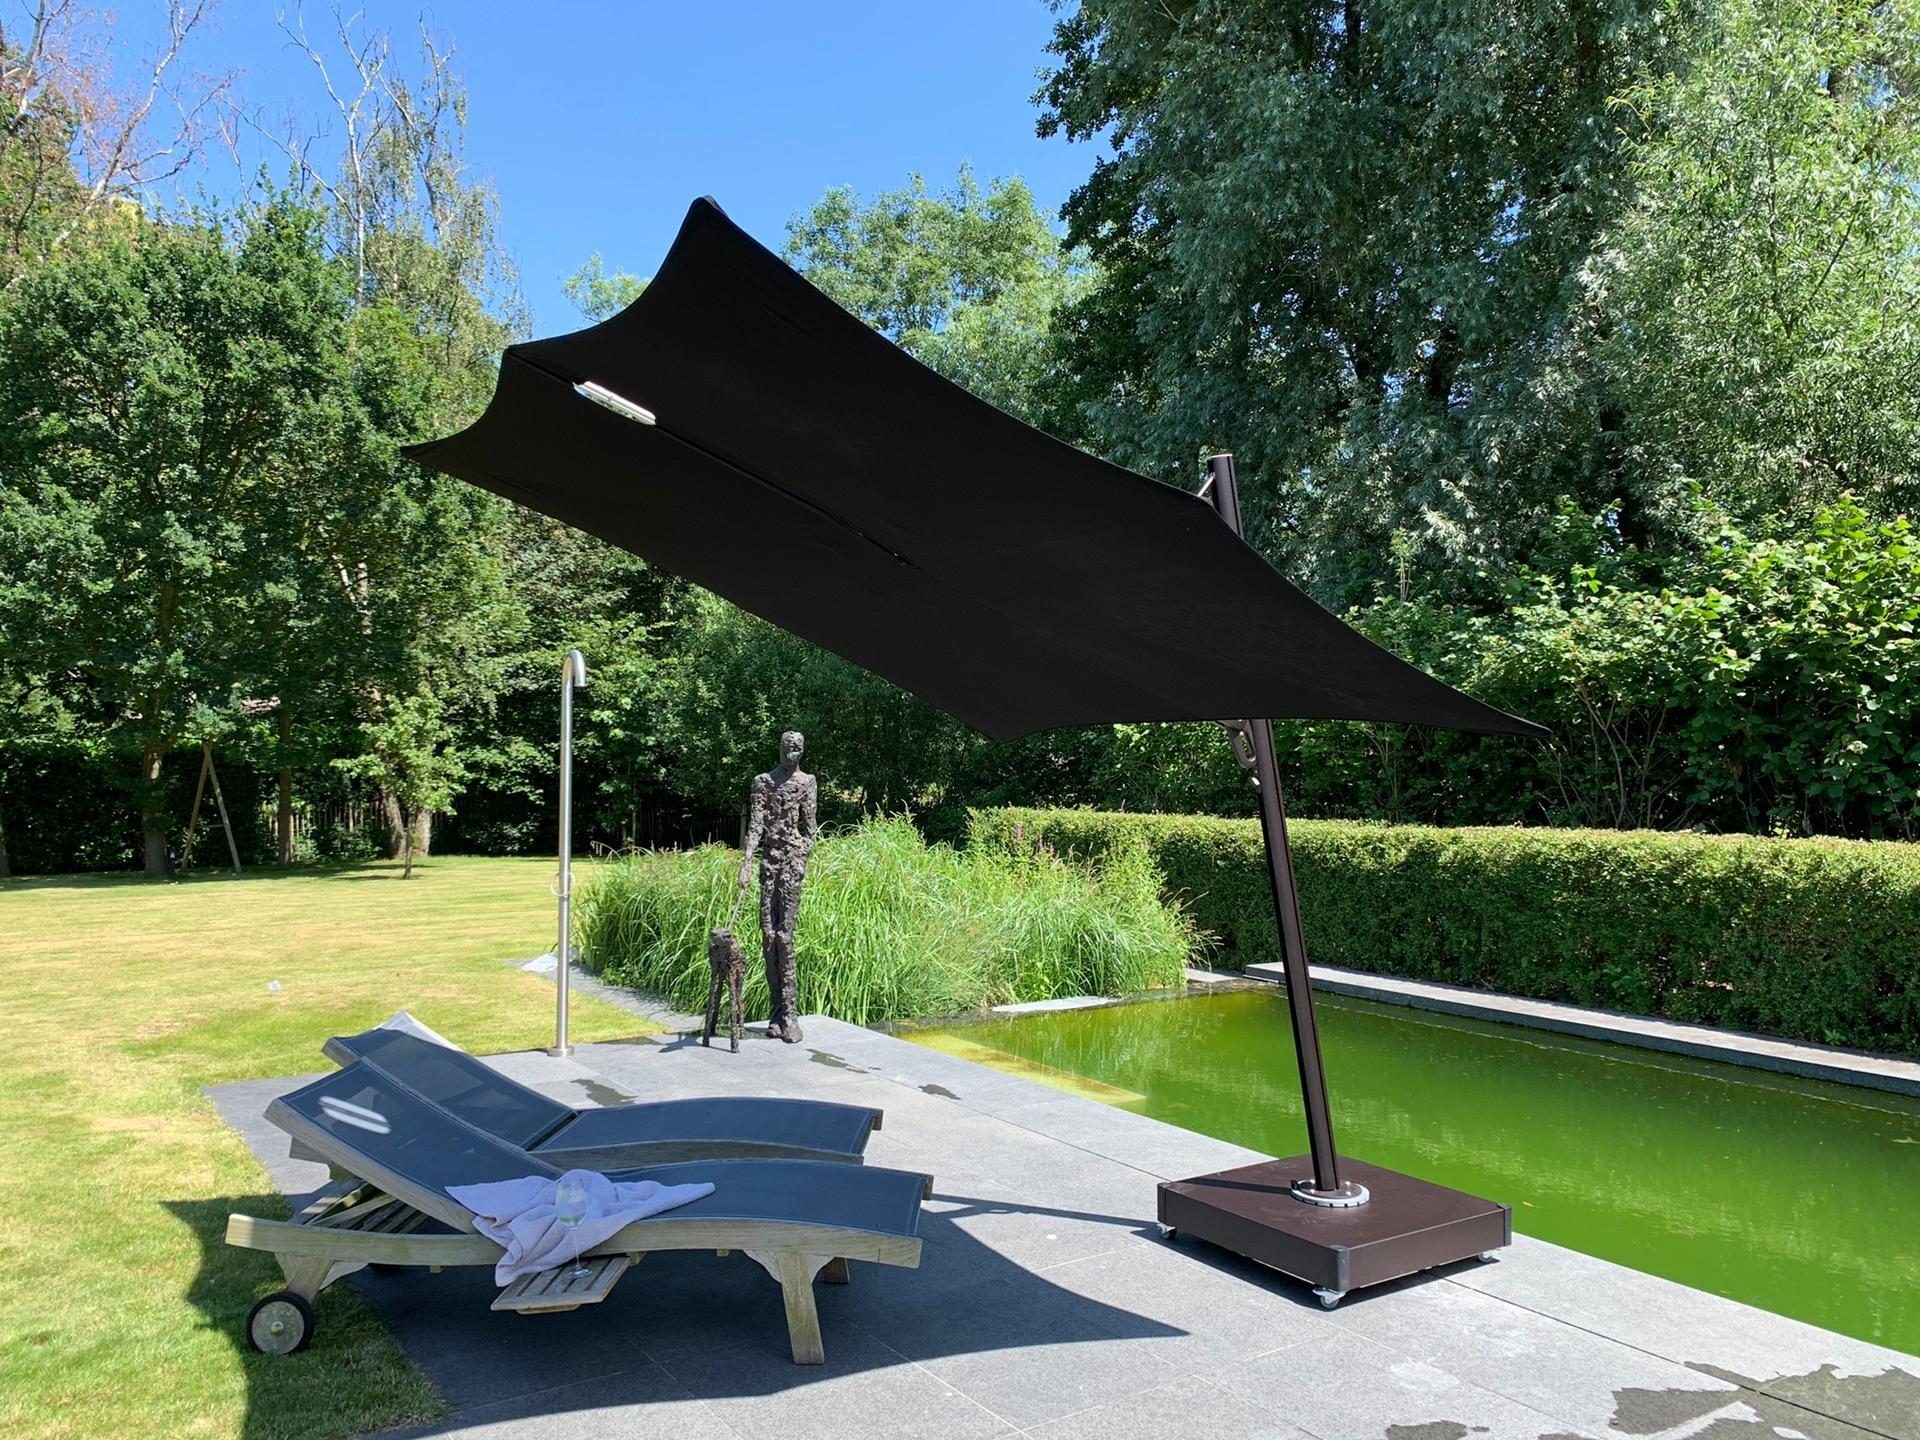 Spectra cantilever umbrella Multibat13.jpg